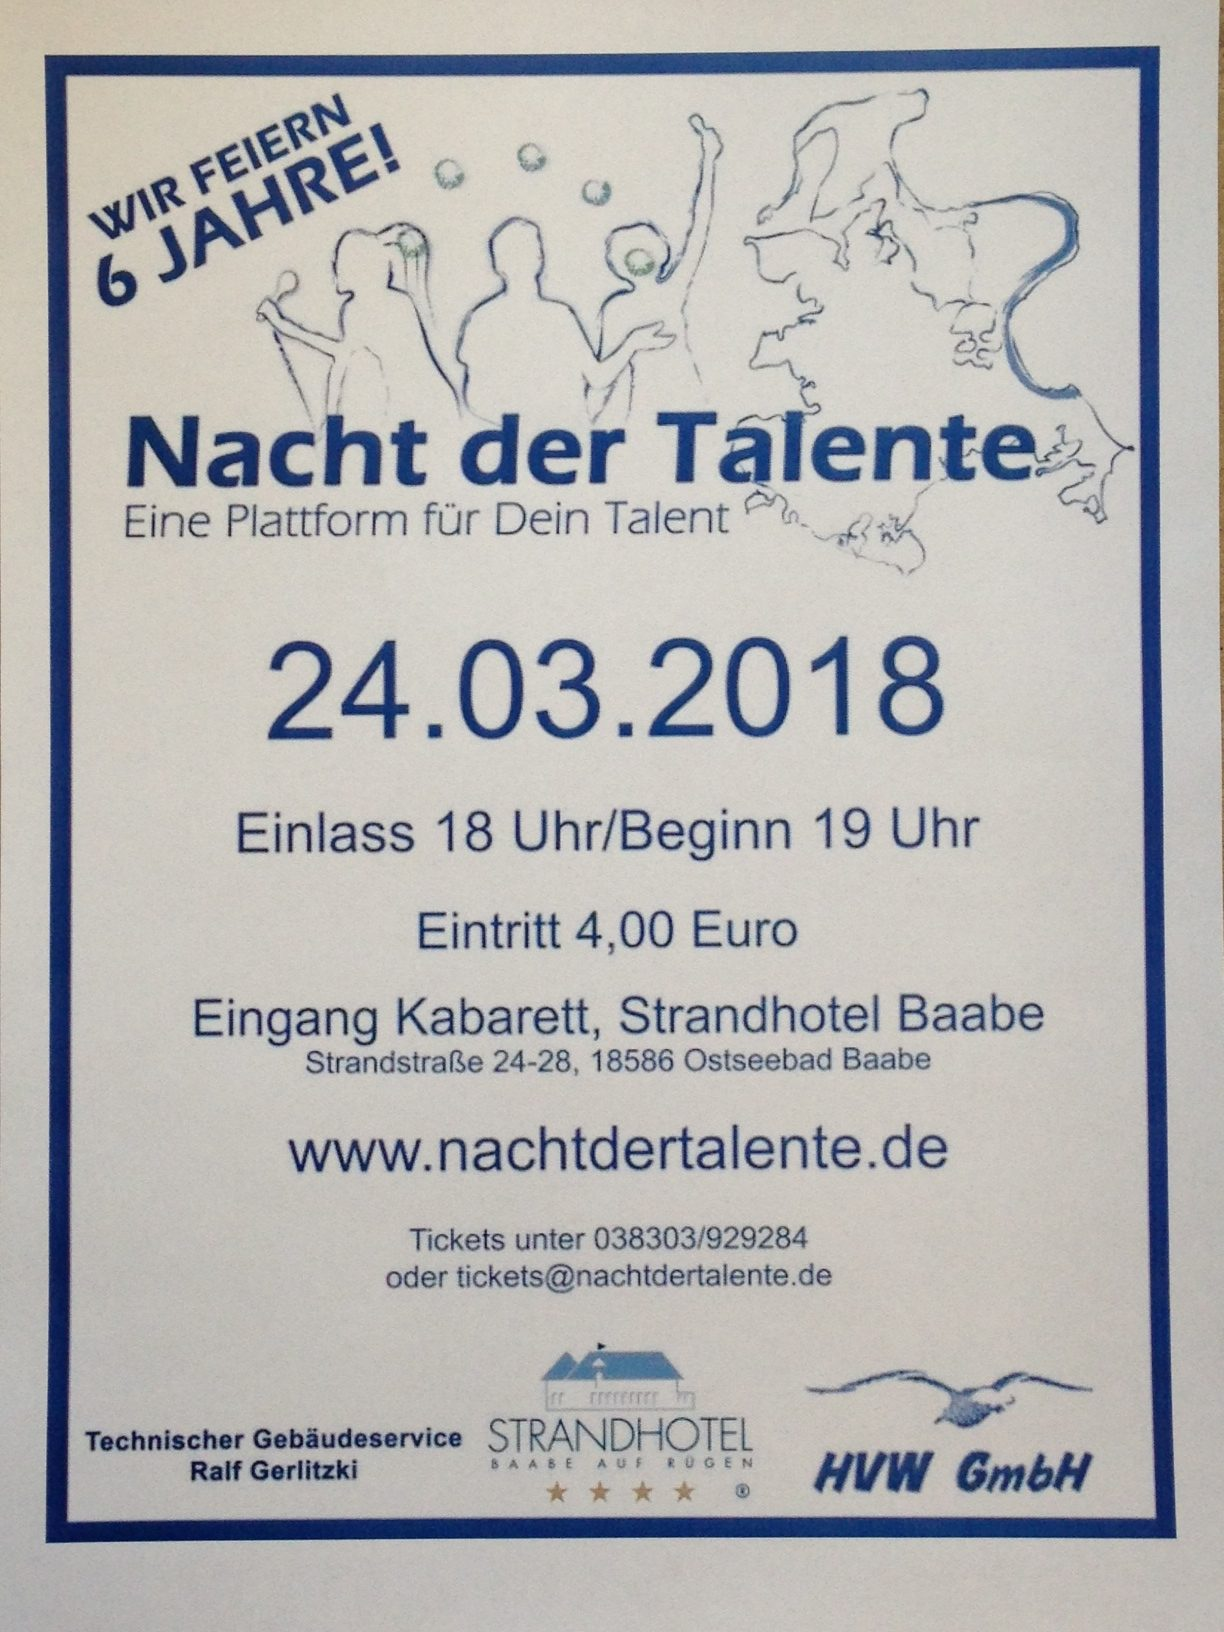 Nacht-der-Talente-e1520247301789